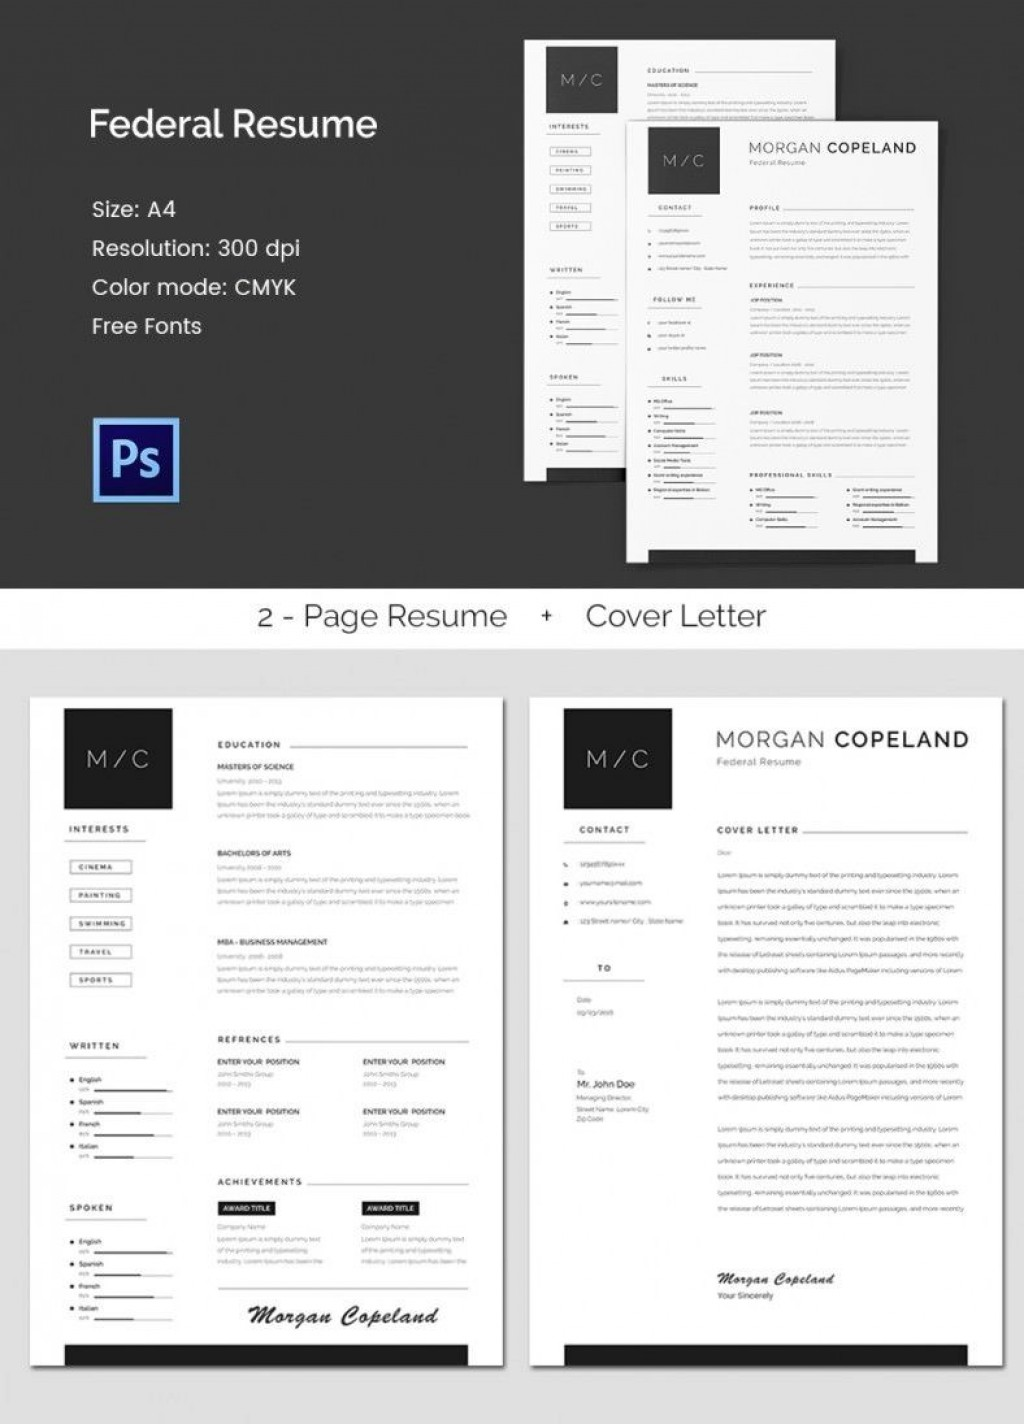 007 Fantastic Software Engineering Resume Template Highest Clarity  Engineer Microsoft Word Cv Free Developer DownloadLarge